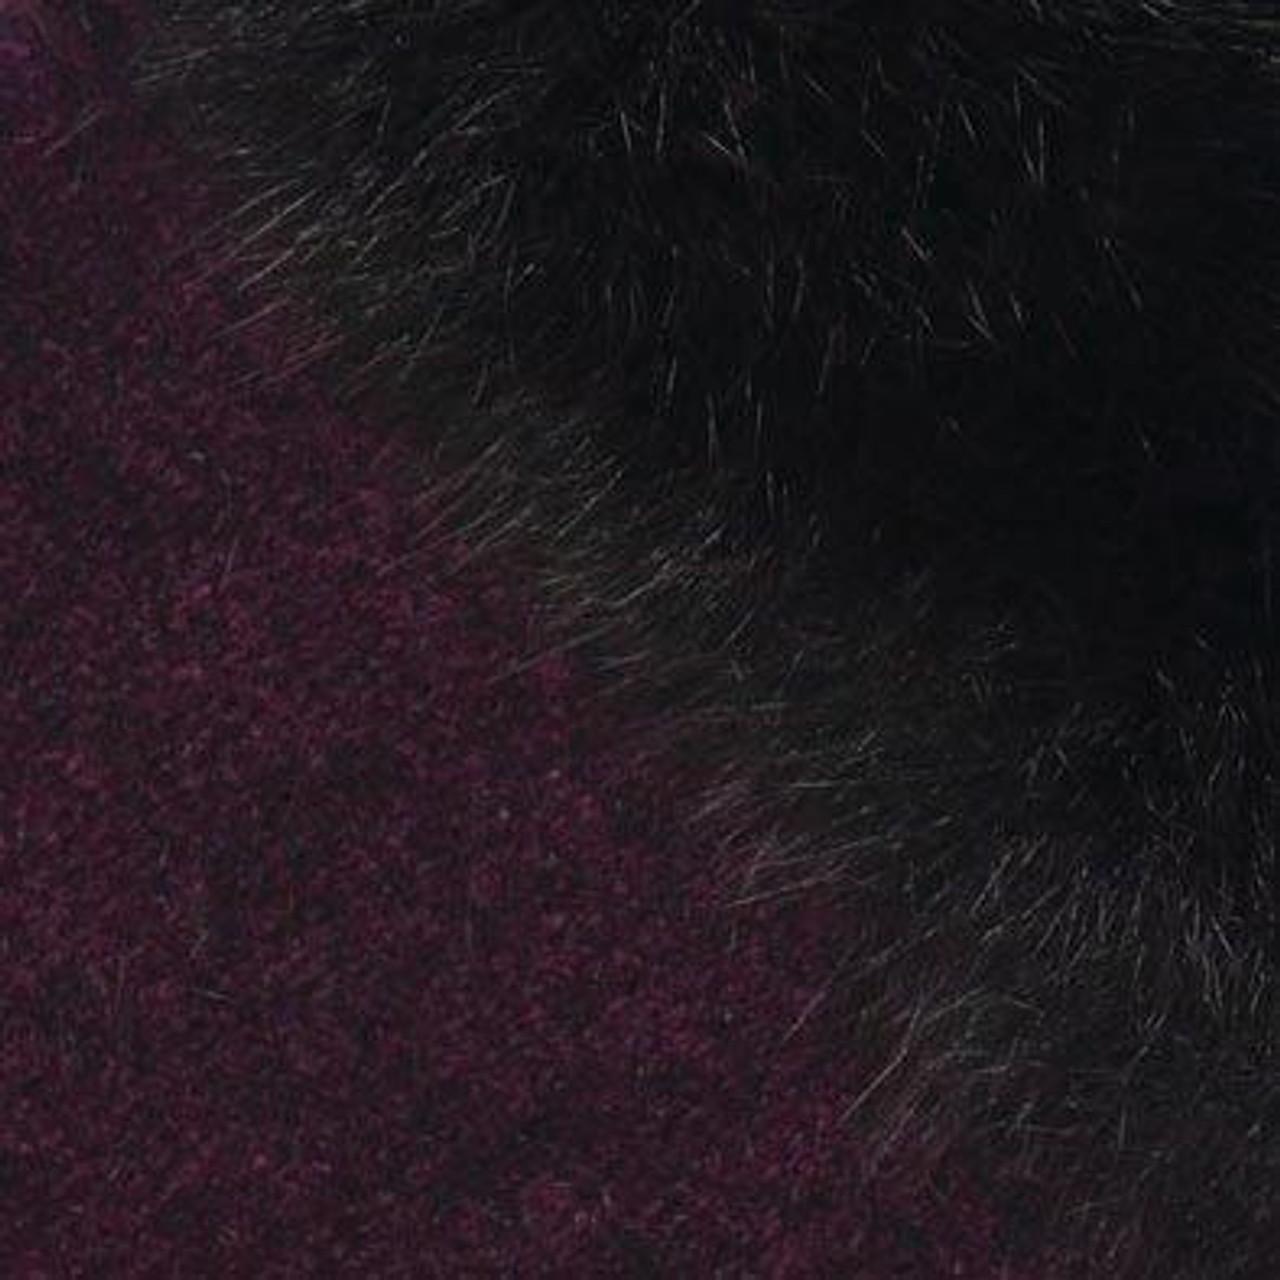 Swatch - Grape / Grape